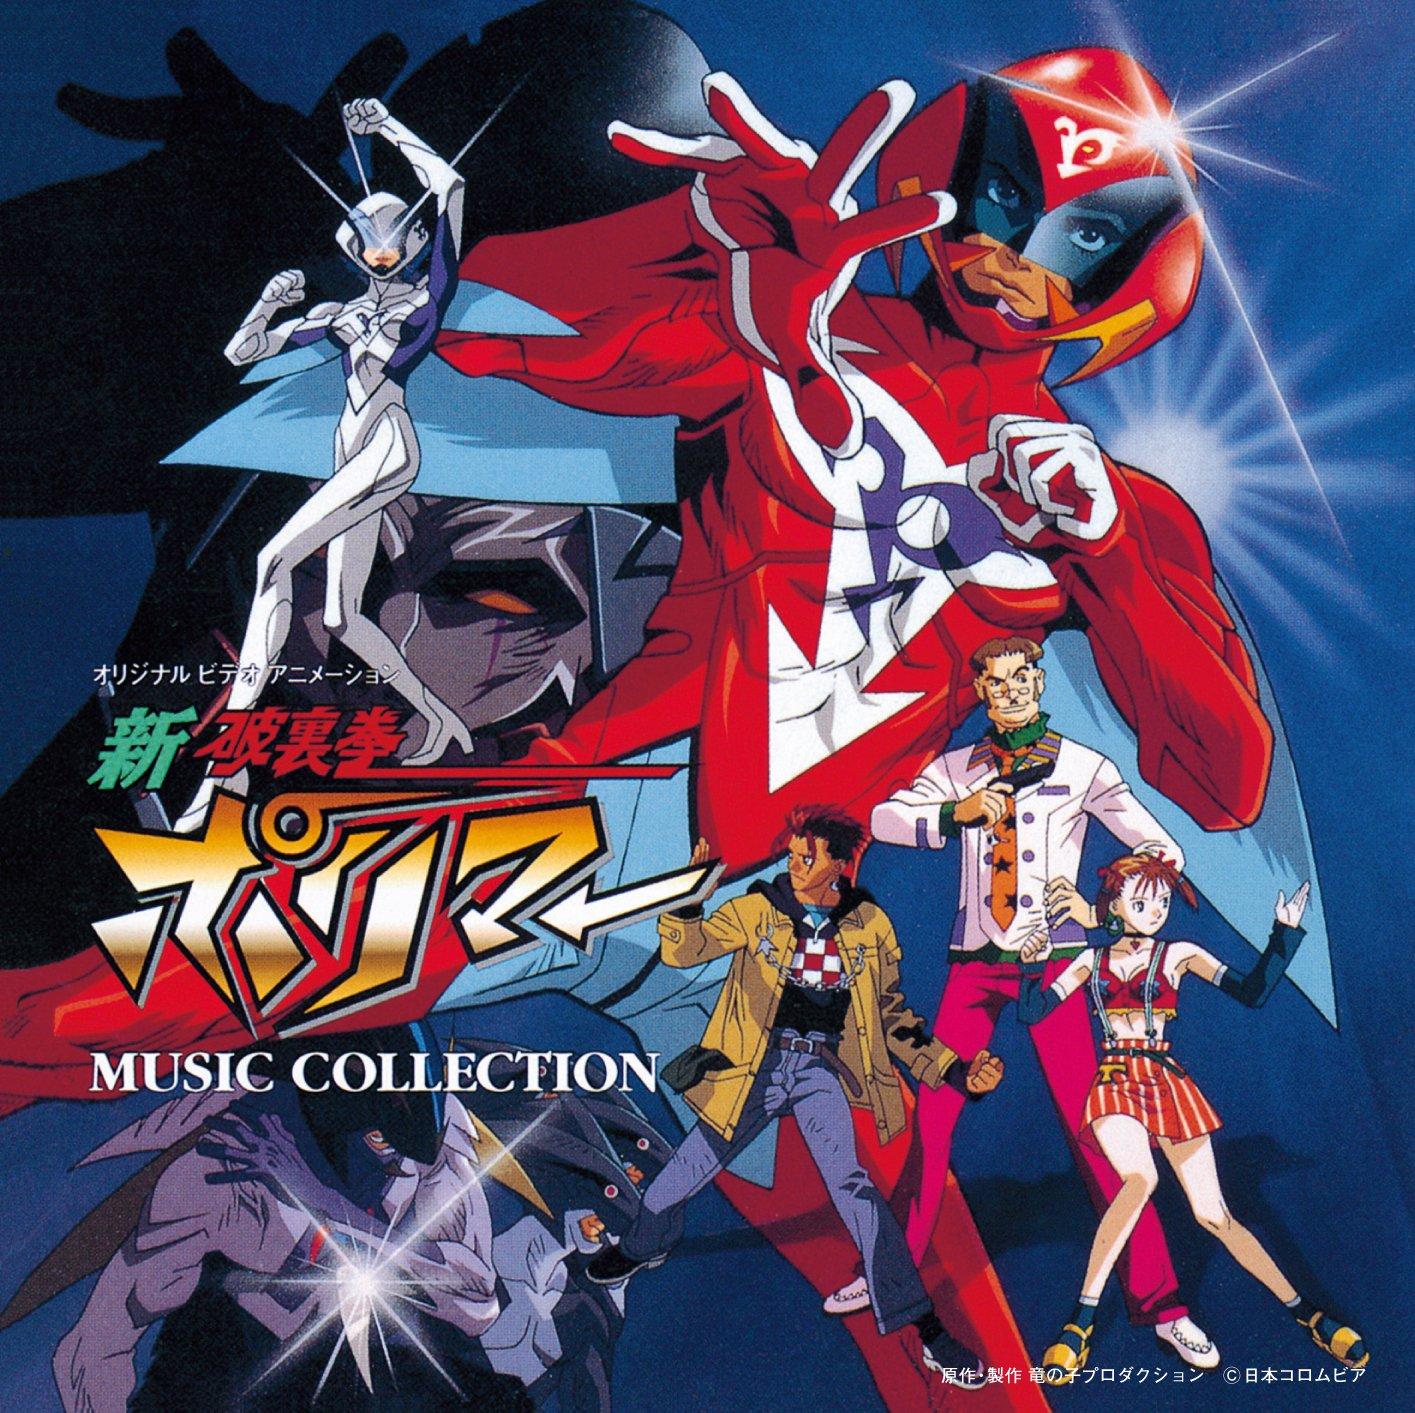 Shin Hariken Polymer Music Coe: Tatsumi Yano: Amazon.es: Música